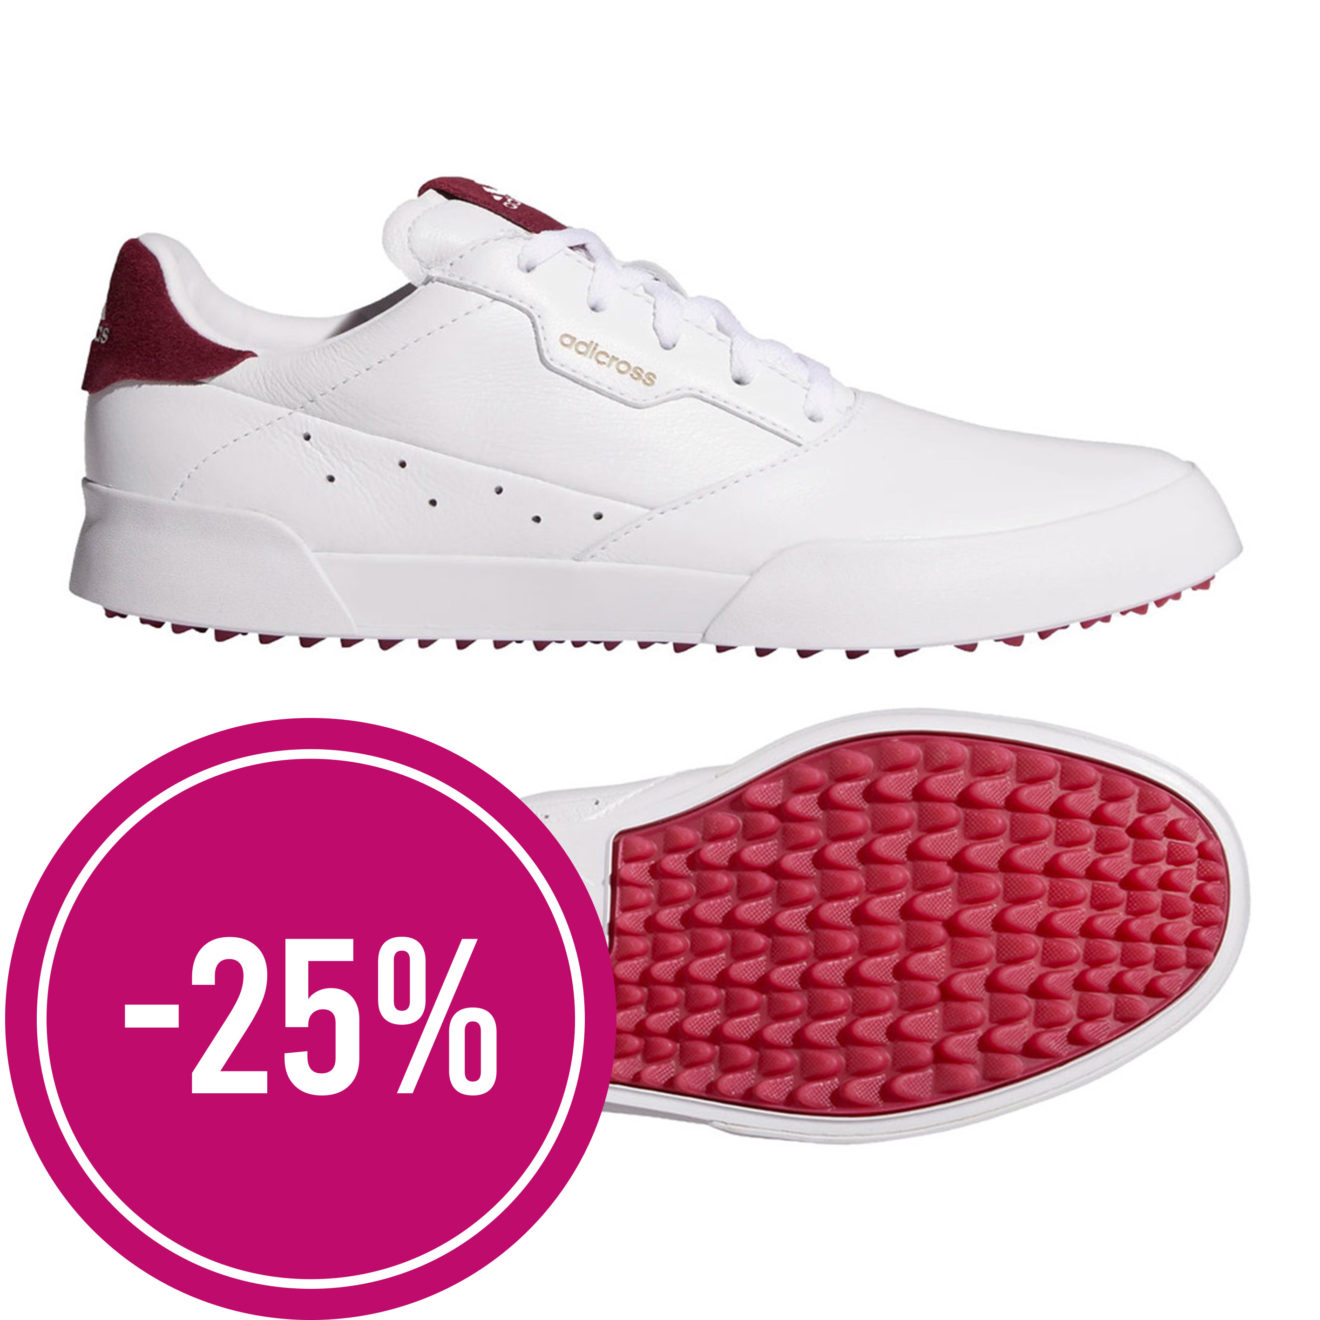 chaussures-adidas-adicross-roses